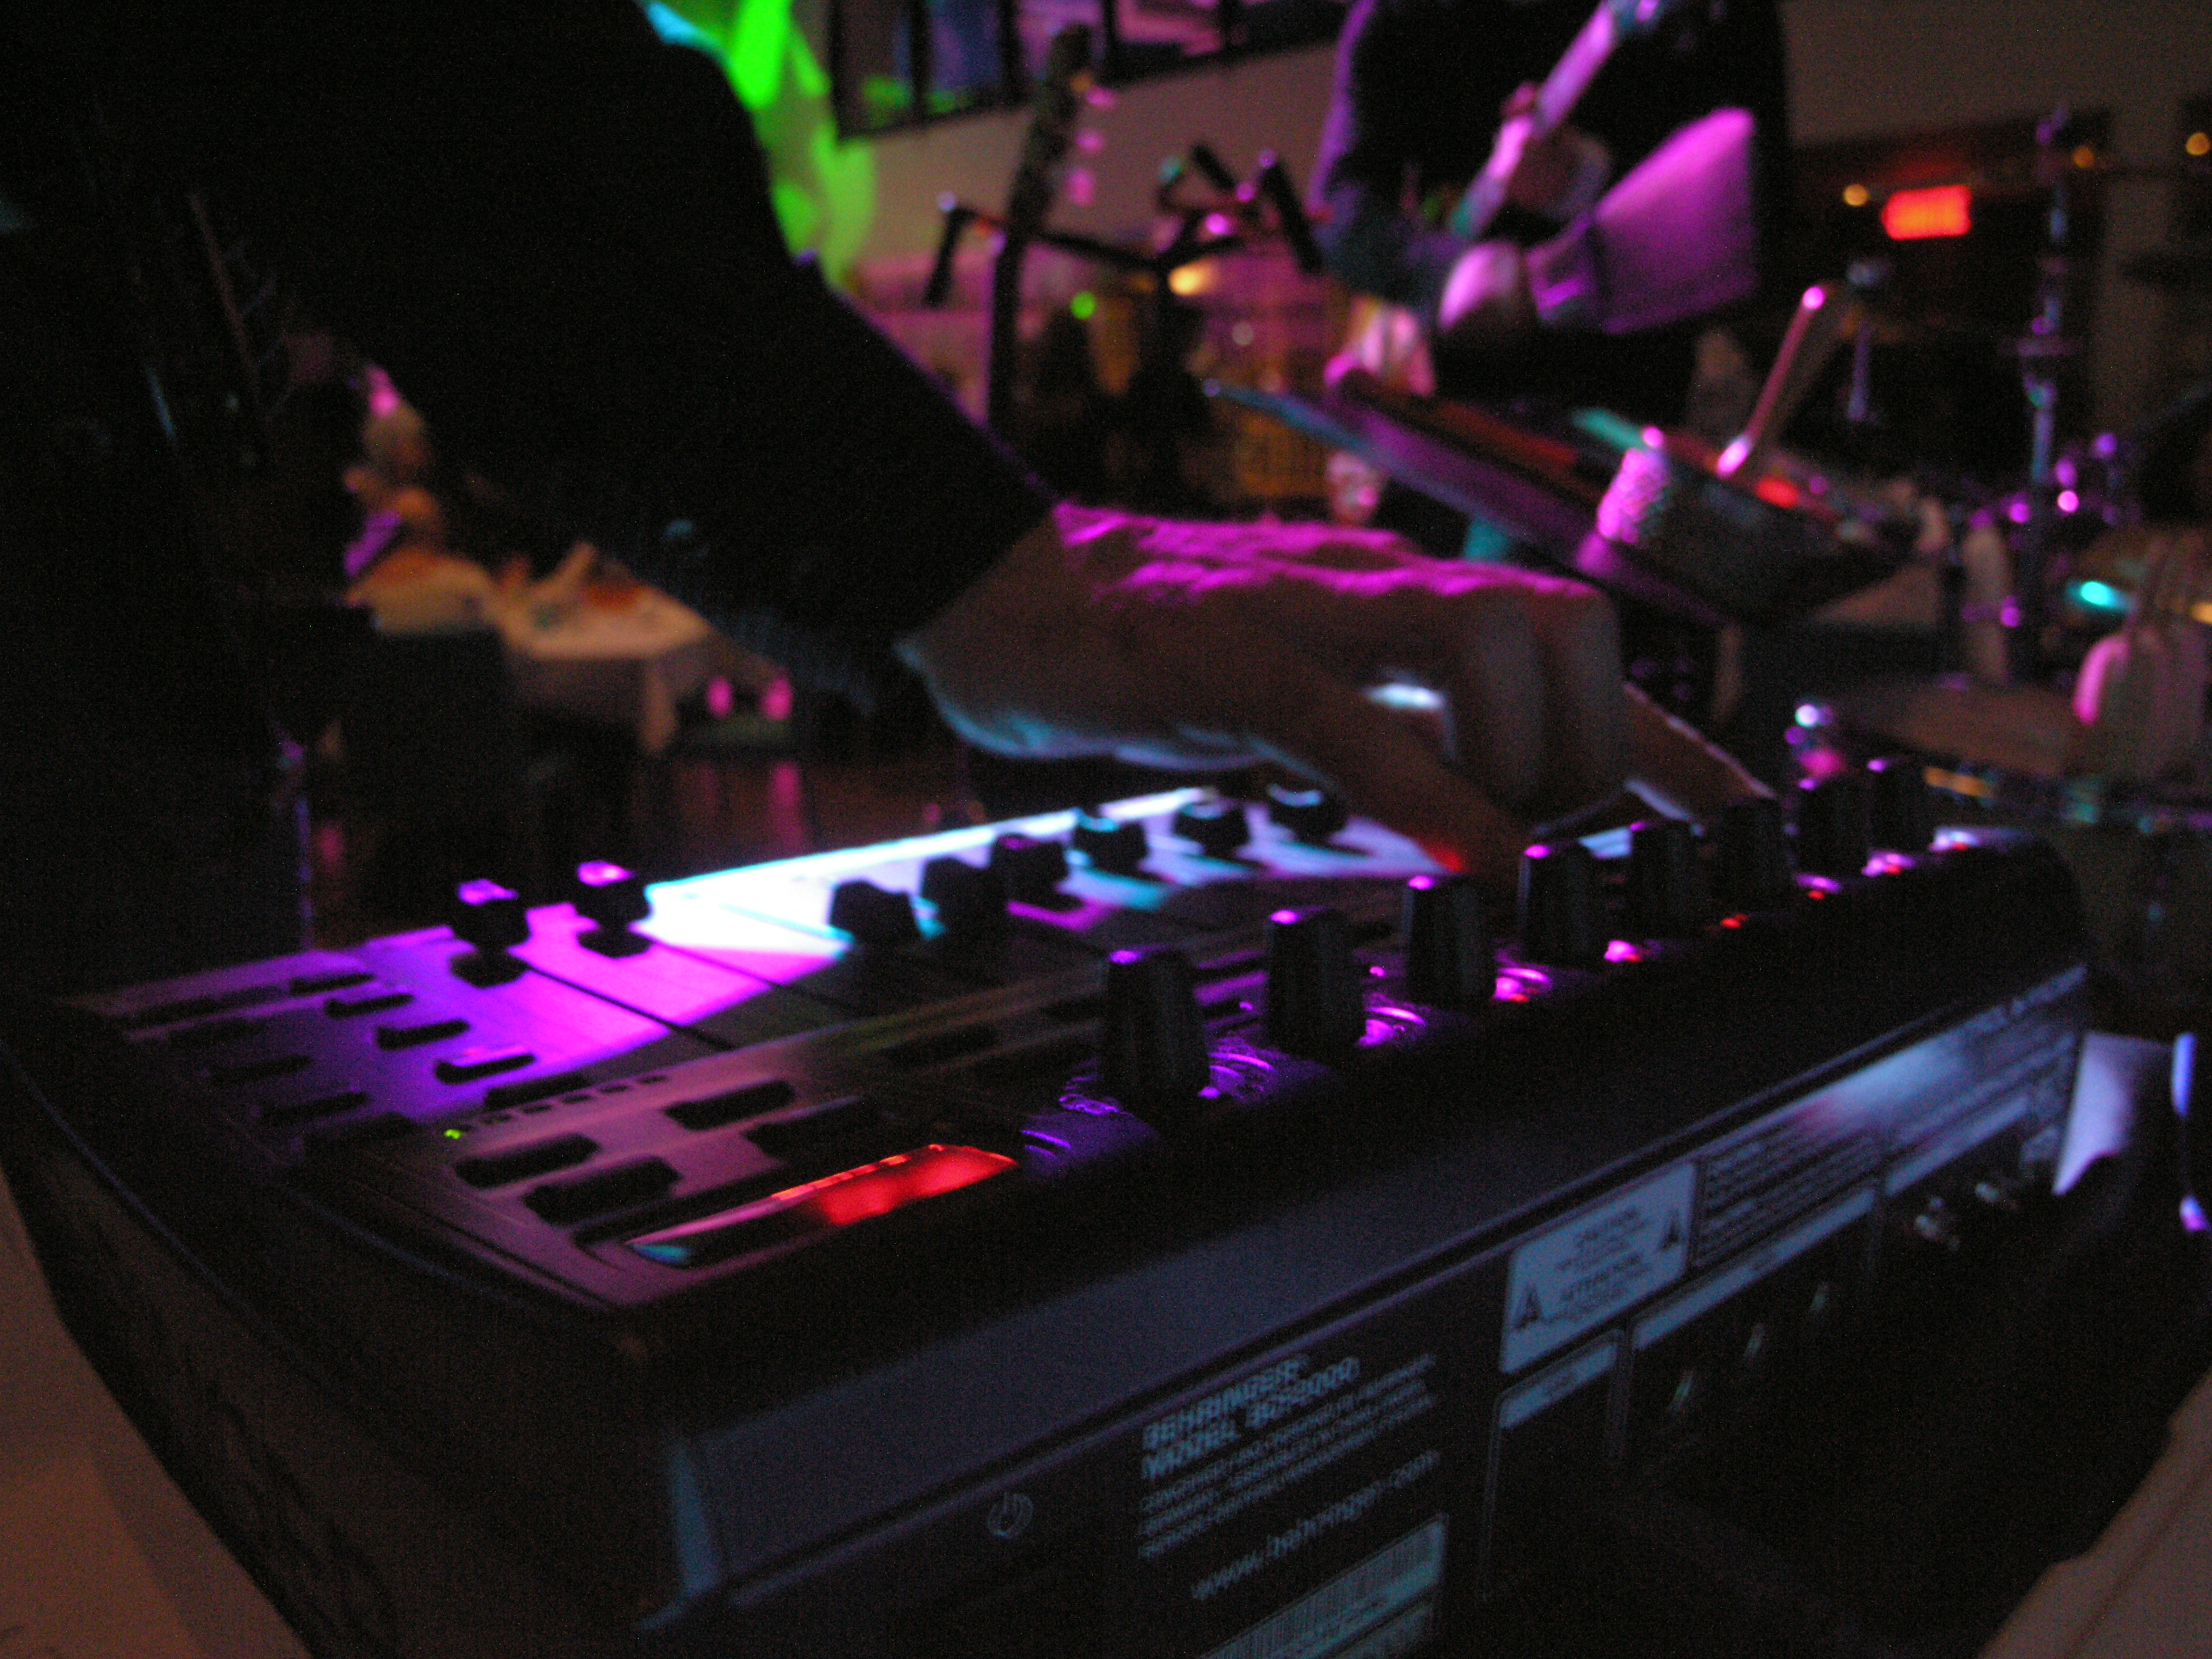 ÜRBEAT MONTRÉAL musiciens DJ électro